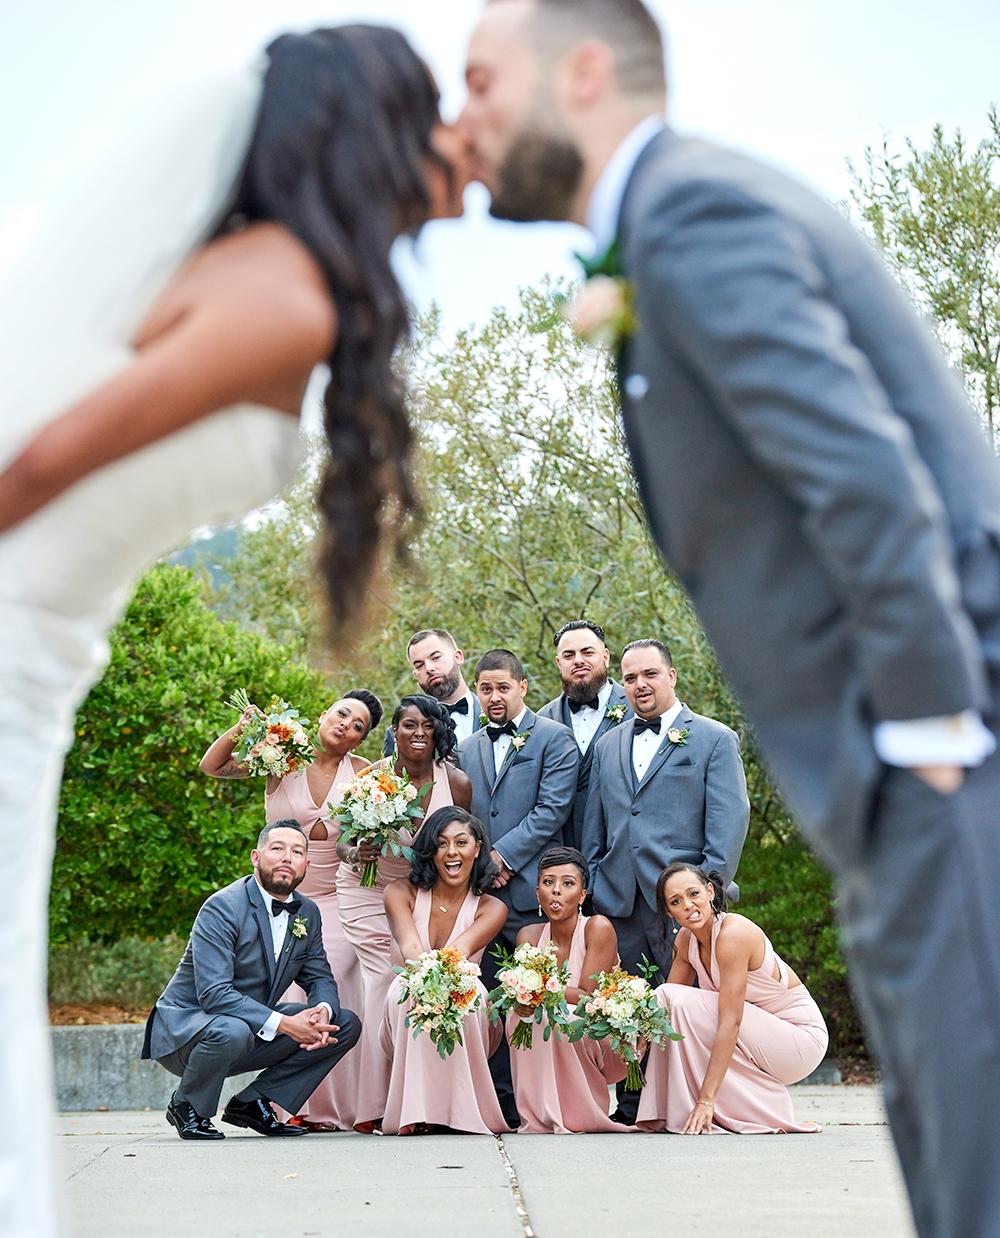 2017KrystalCraven-wedding-party-posed-portrait-fun